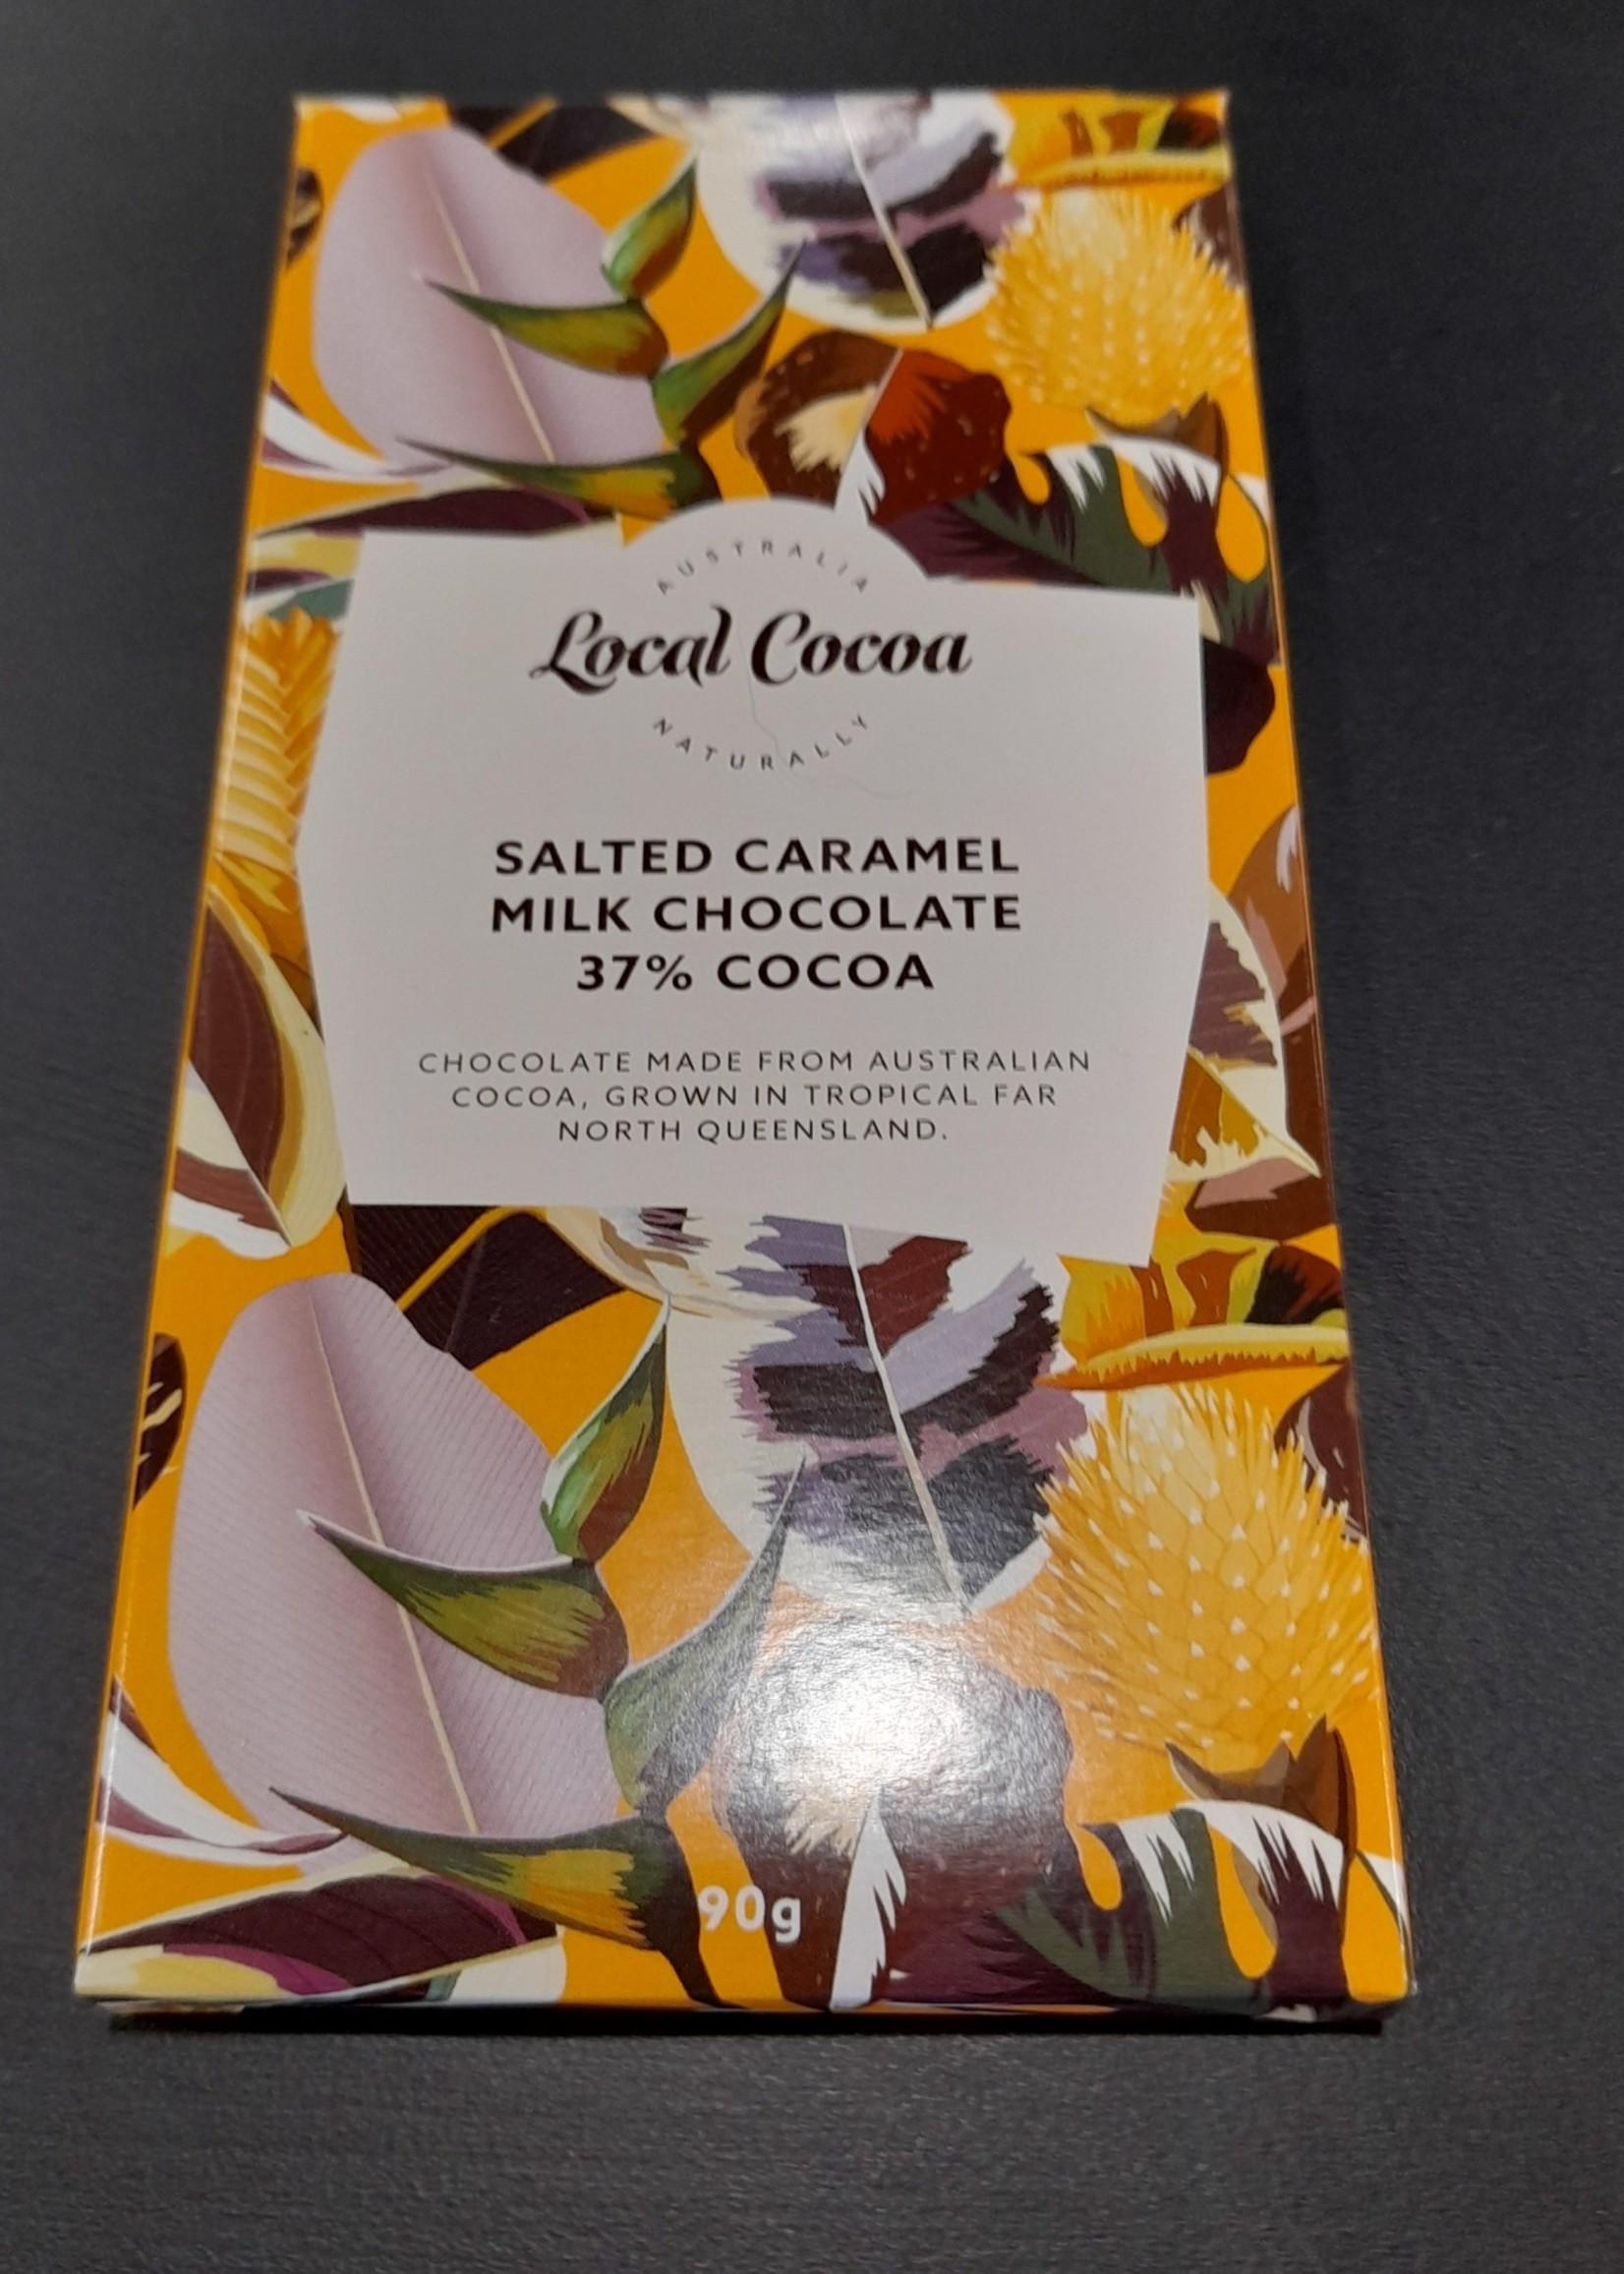 Local Cocoa Local Cocoa Salted Caramel Milk Chocolate 37%